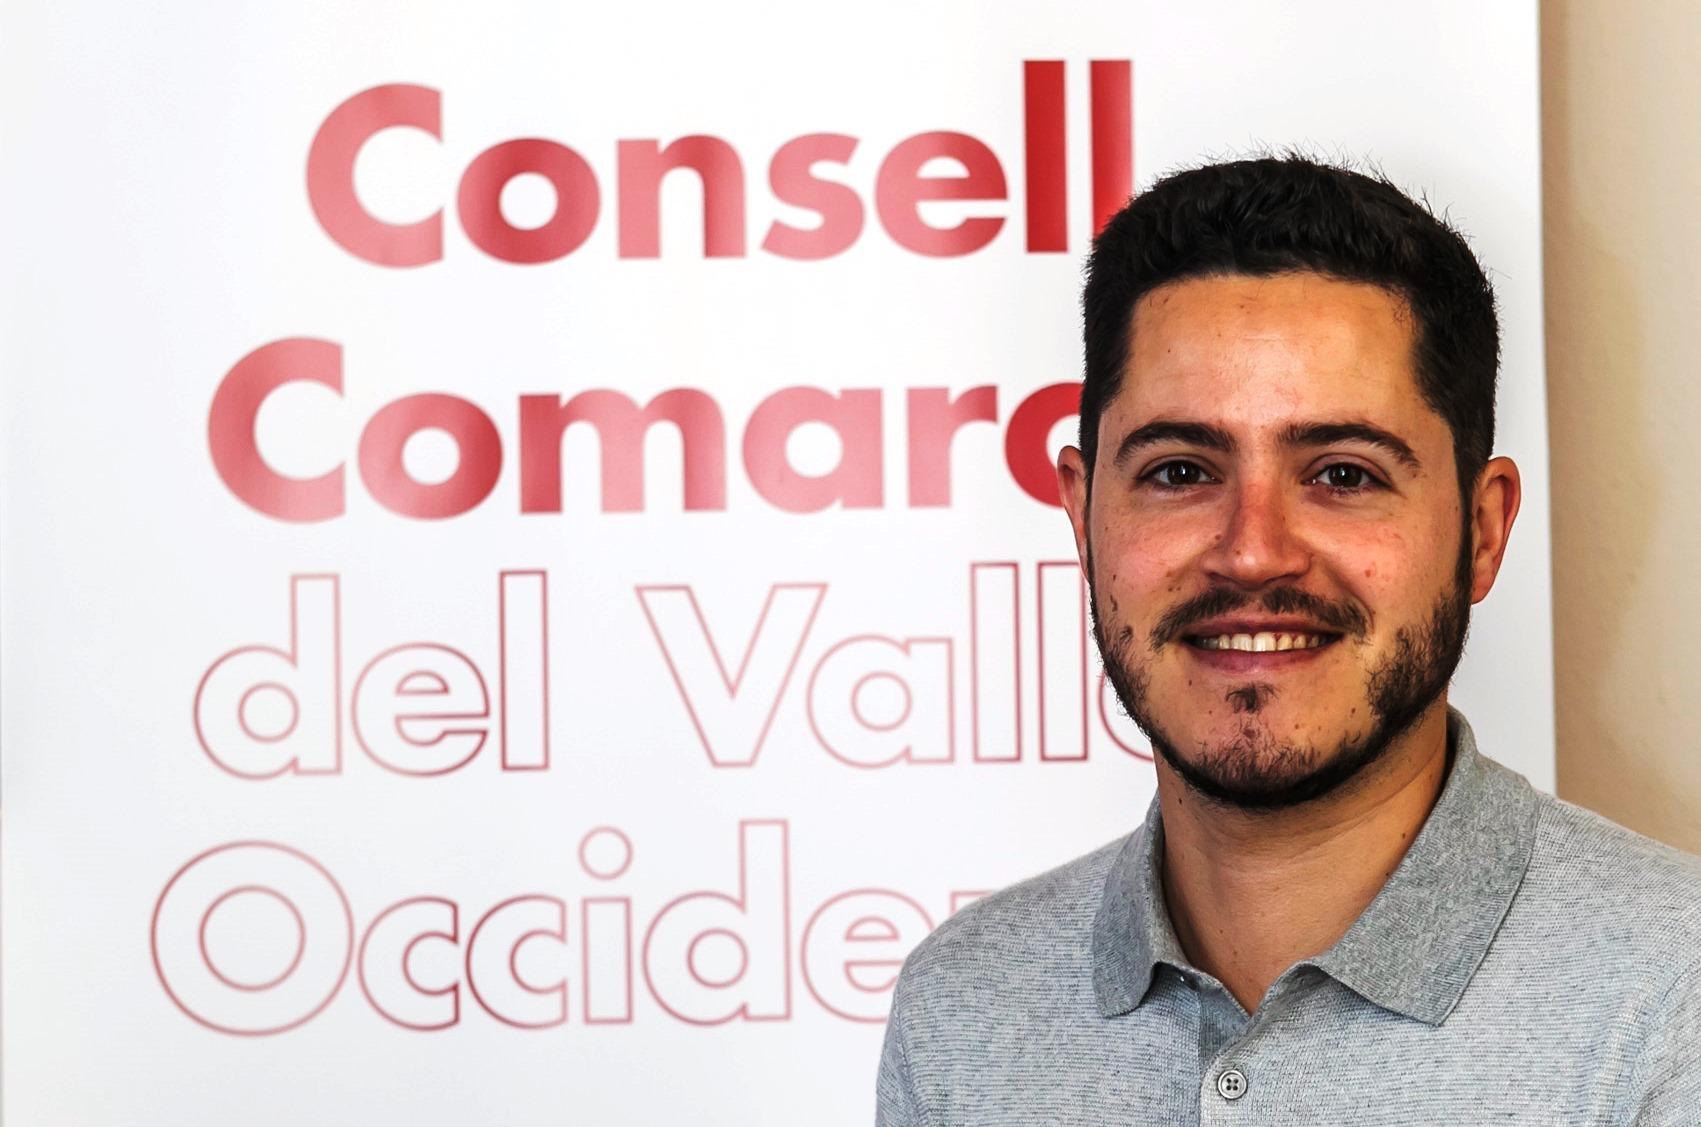 Carles Rodríguez, vicepresident del Consell Comarcal del Vallès Occidental